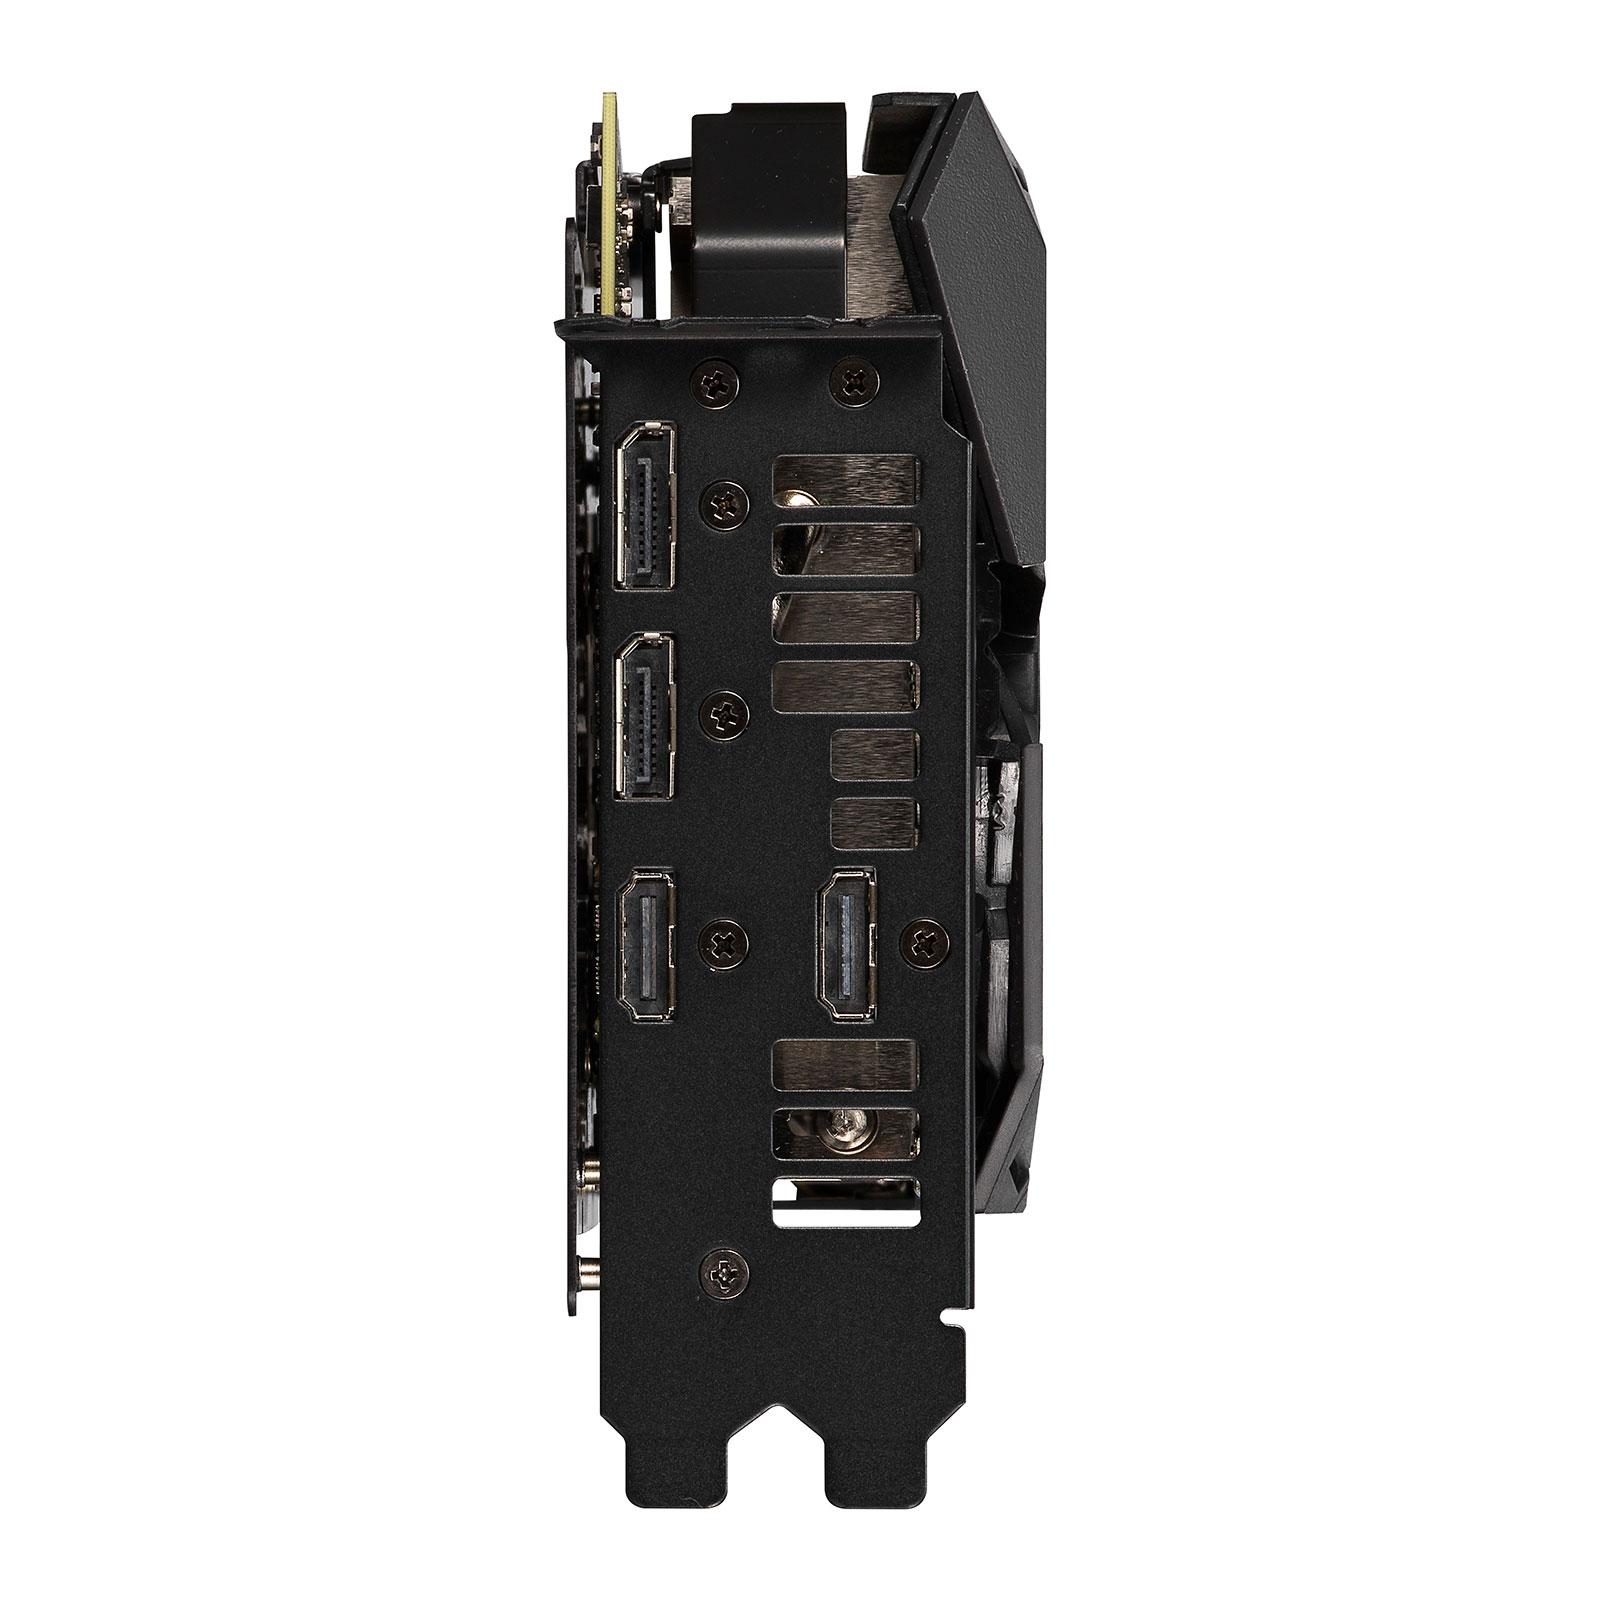 ROG Strix GeForce RTX 2060 OC Edition 6GB GDDR6 (90YV0CI0-M0NA00) - Achat / Vente Carte graphique sur Picata.fr - 1